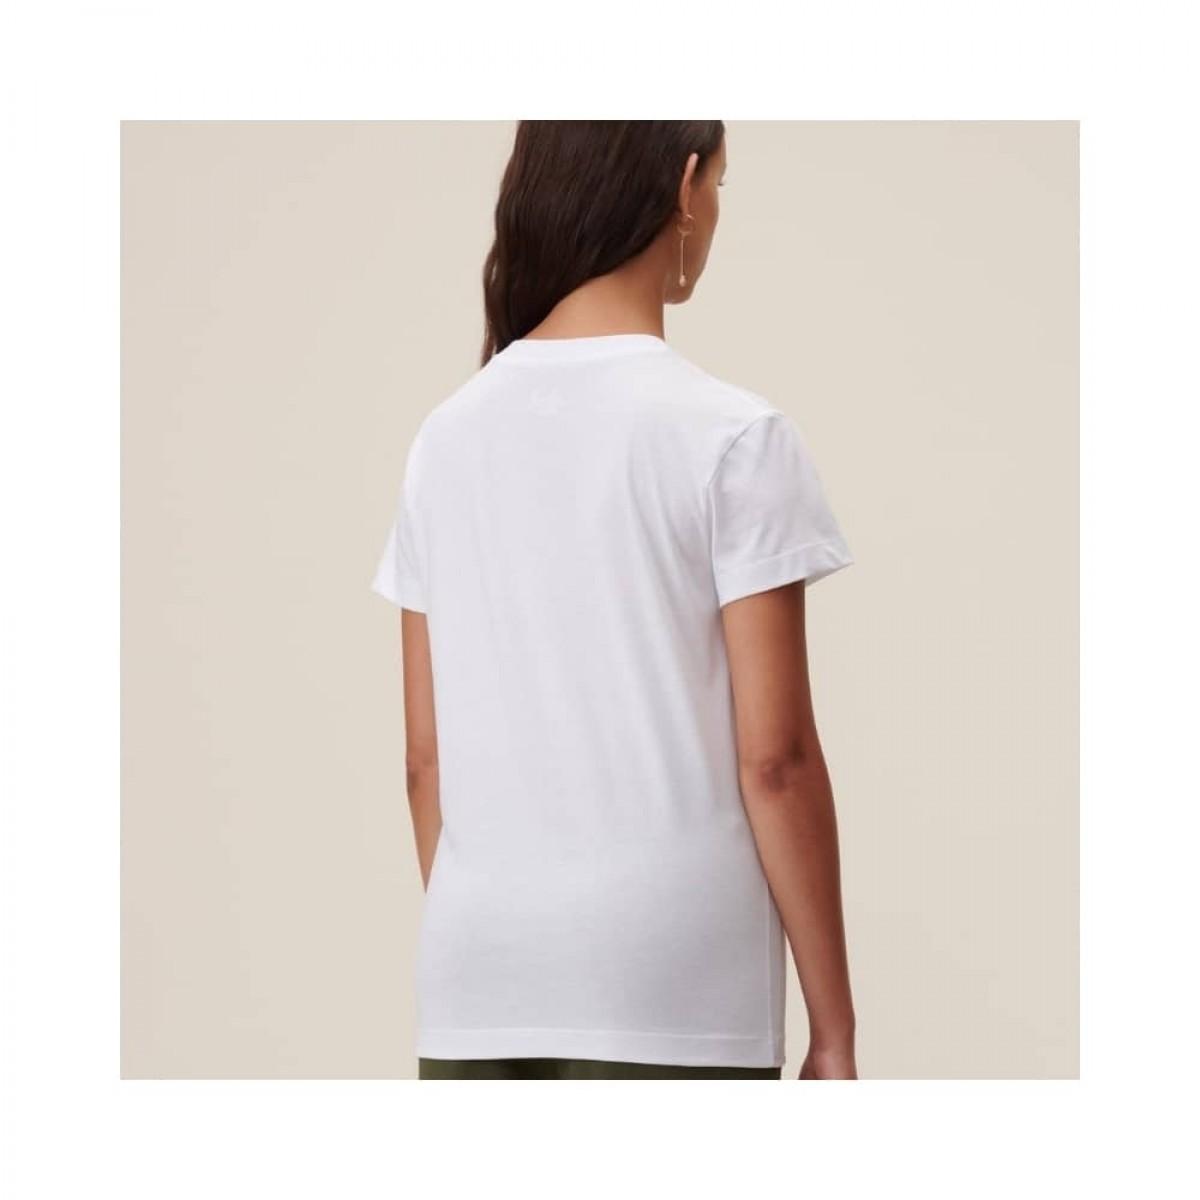 cara oasis t-shirt - white - model ryg